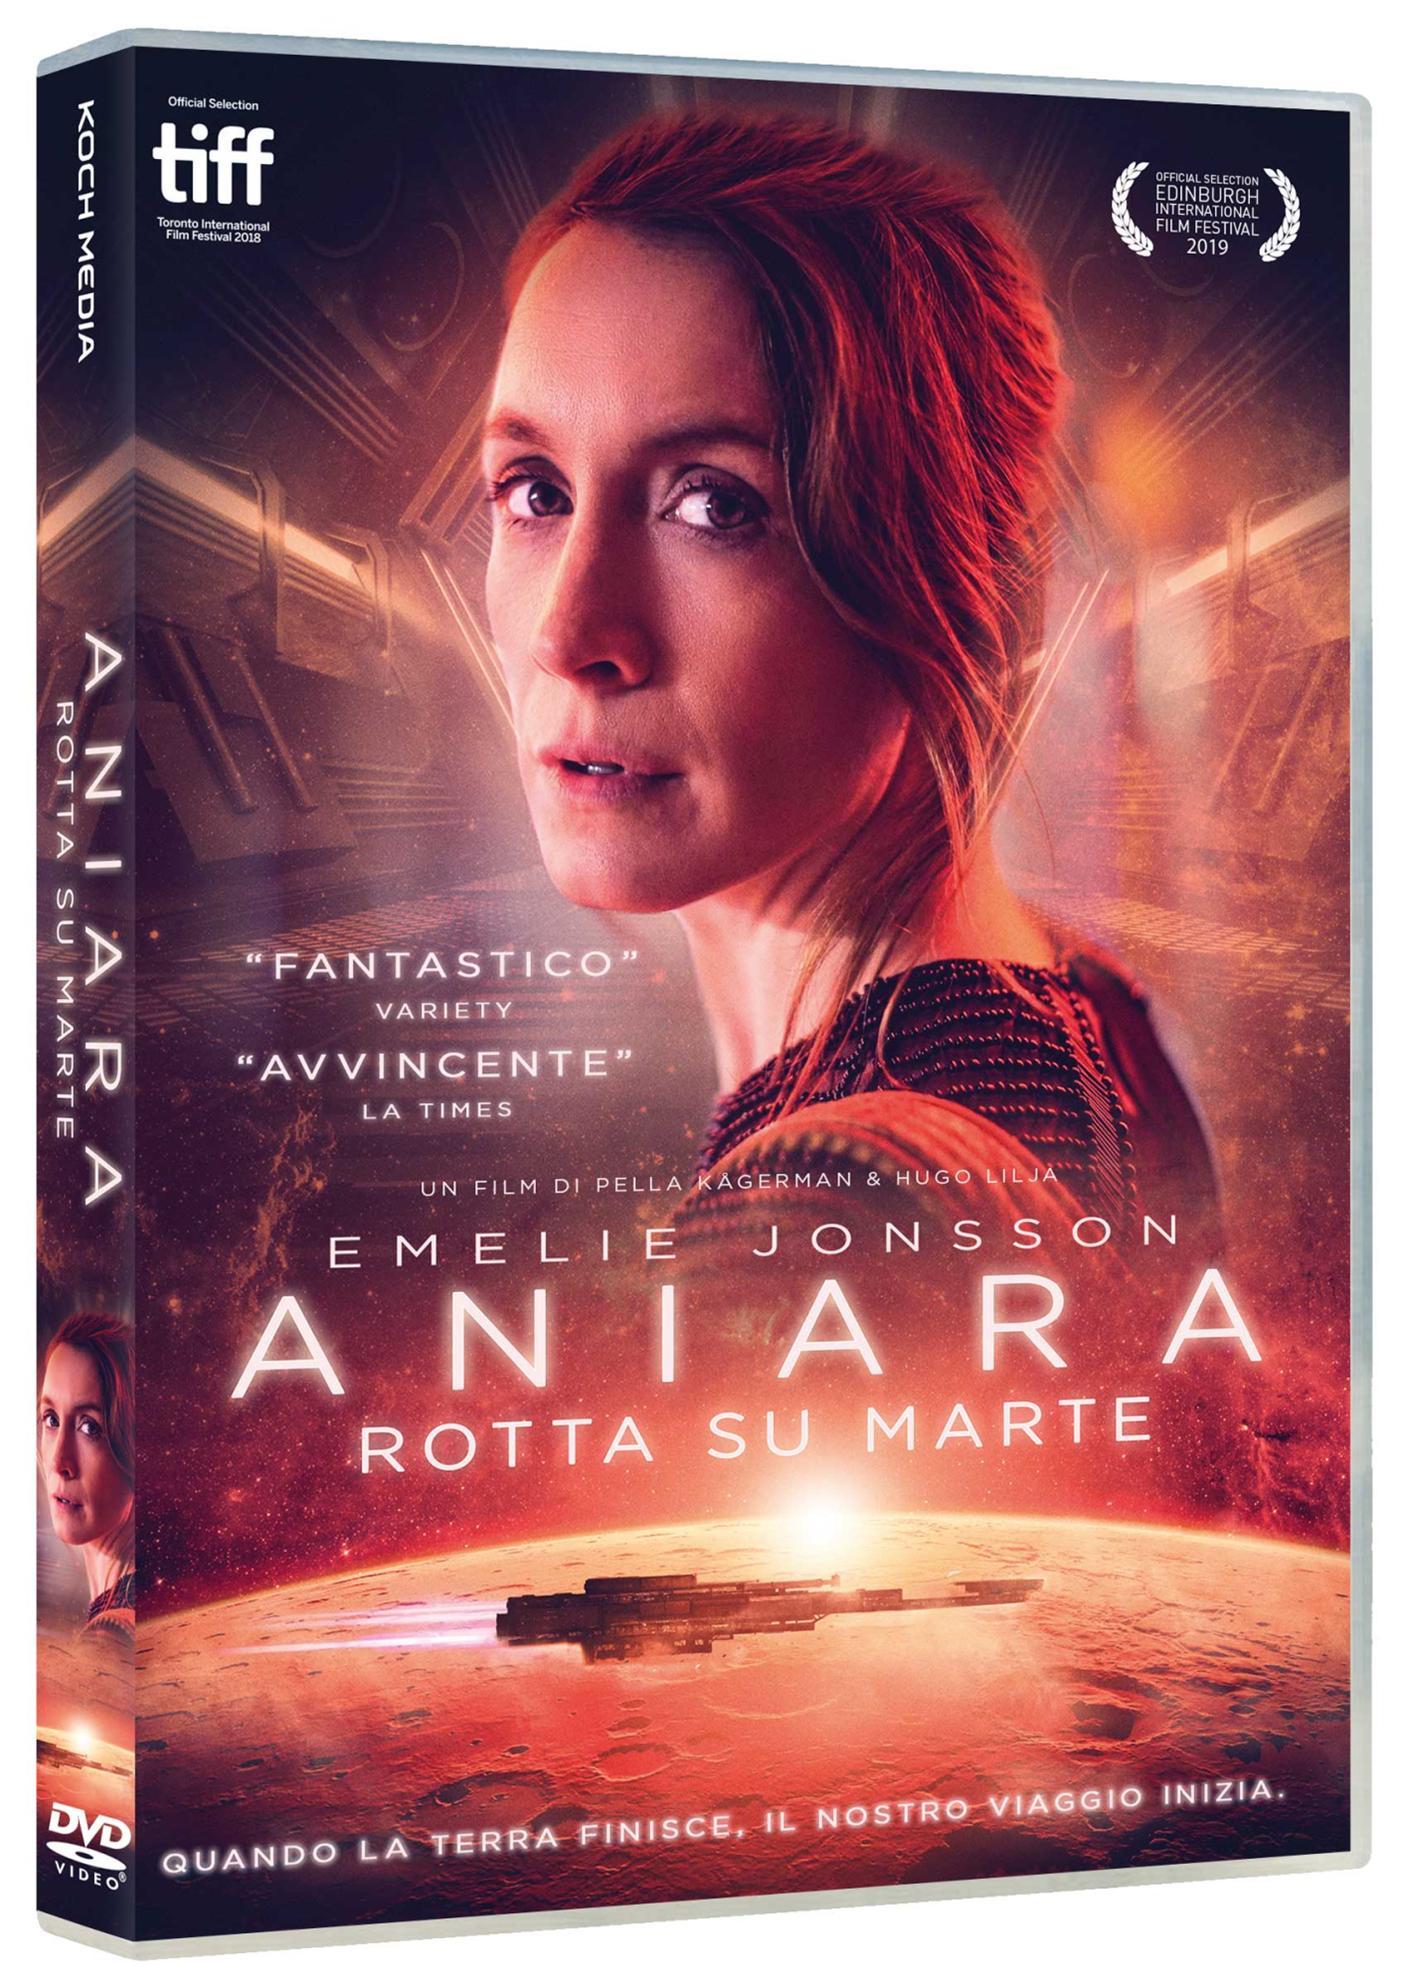 ANIARA - ROTTA SU MARTE (DVD)